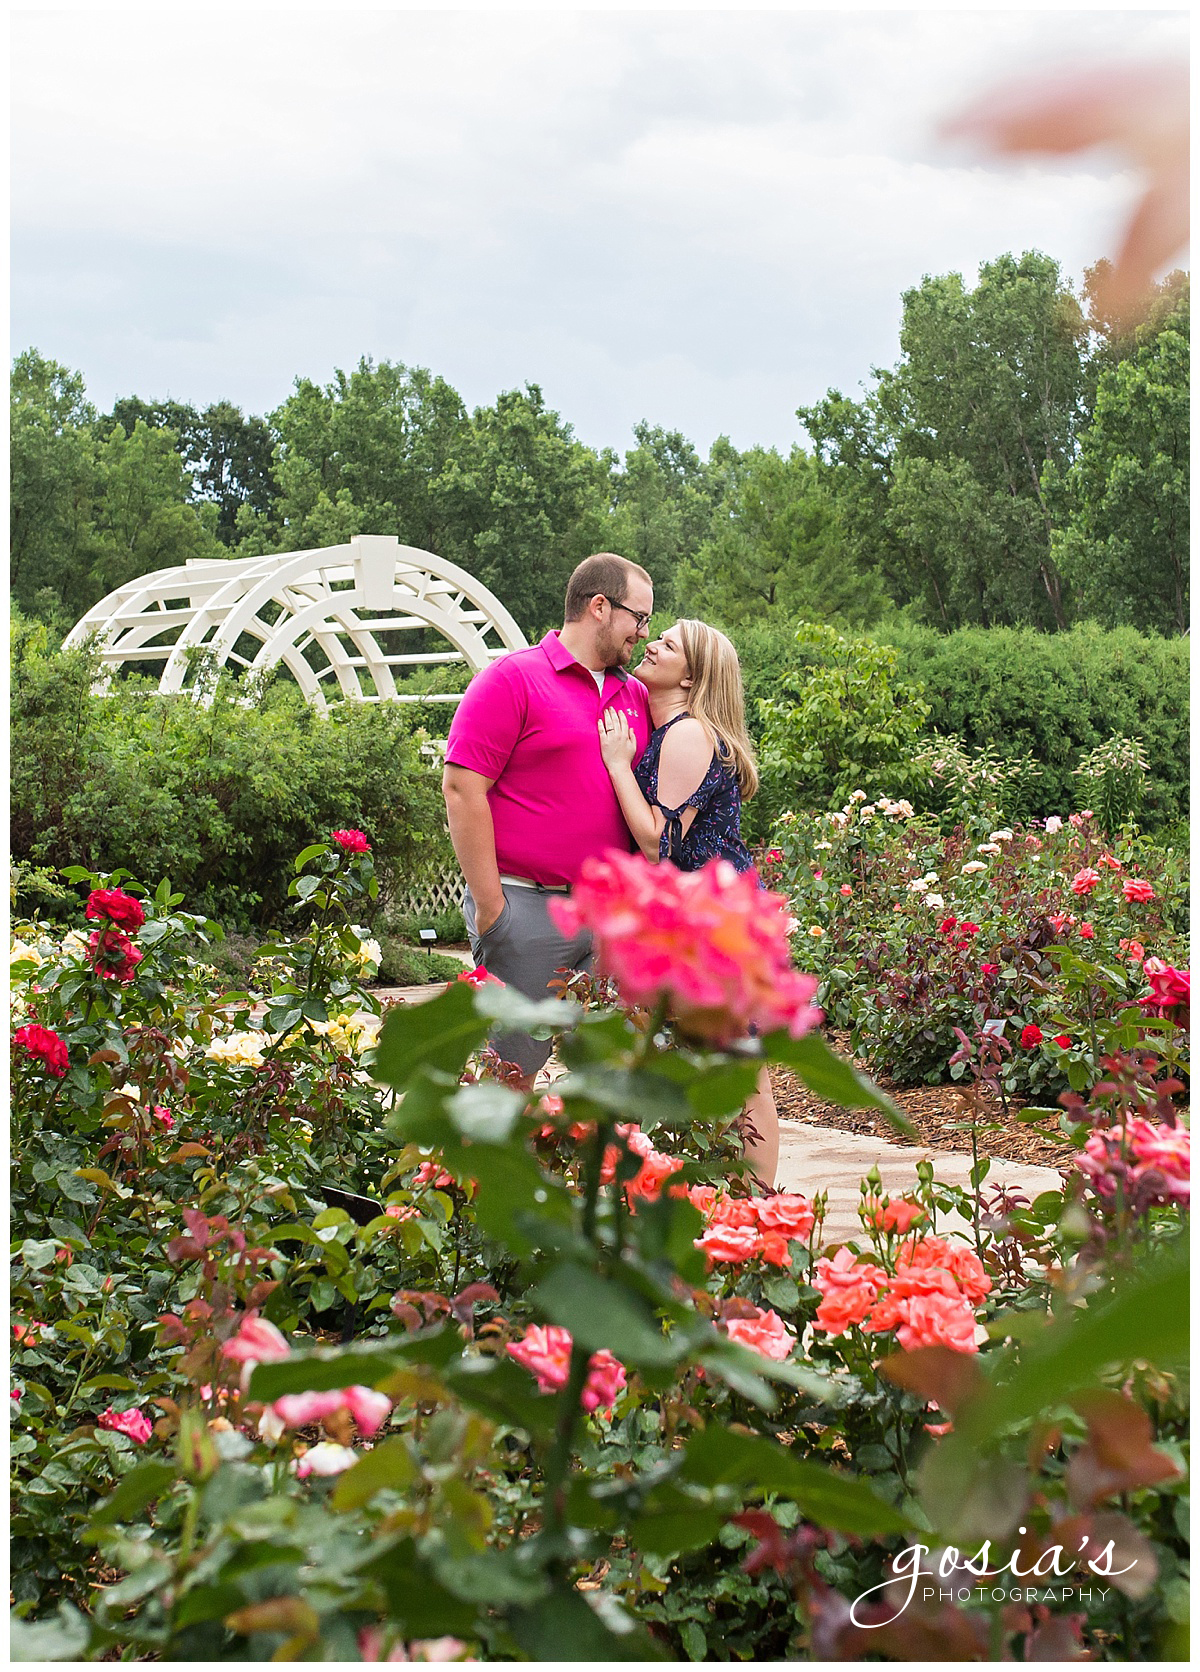 Gosias-Photography-Appleton-wedding-photographer-fall-engagement-session-Green-Bay-Botanical-Gardens-GBBG-_0010.jpg